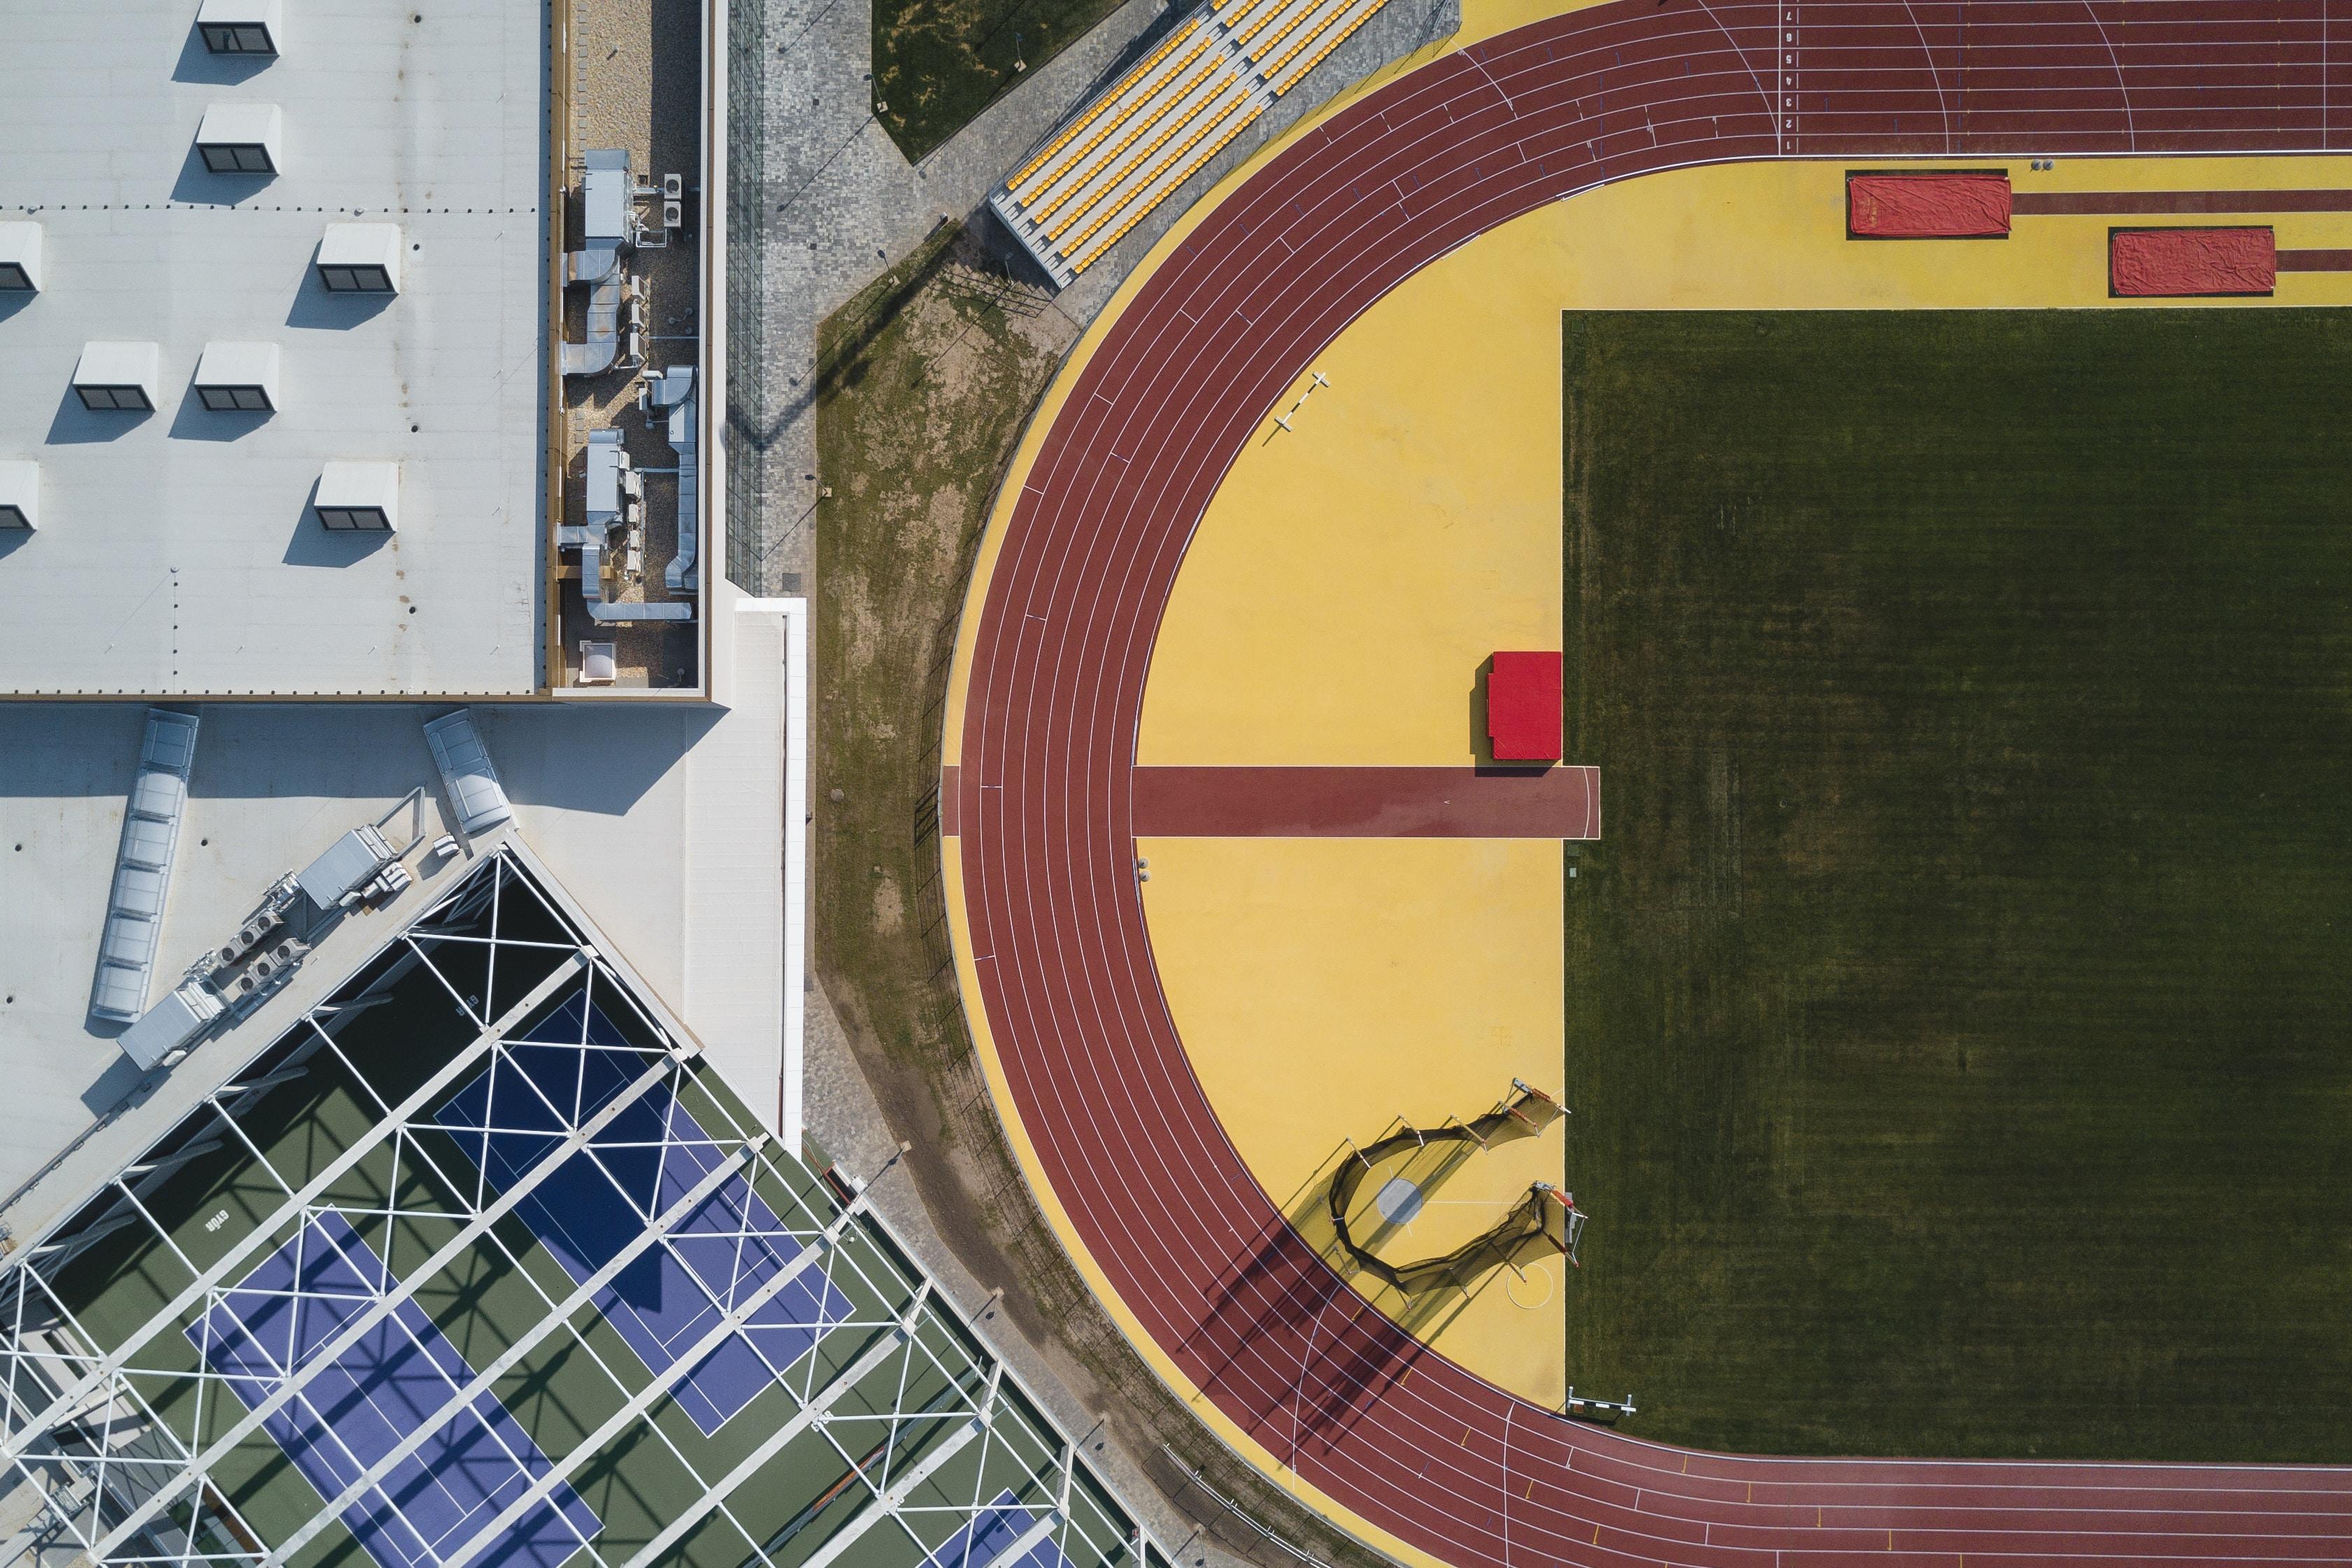 top view of stadium